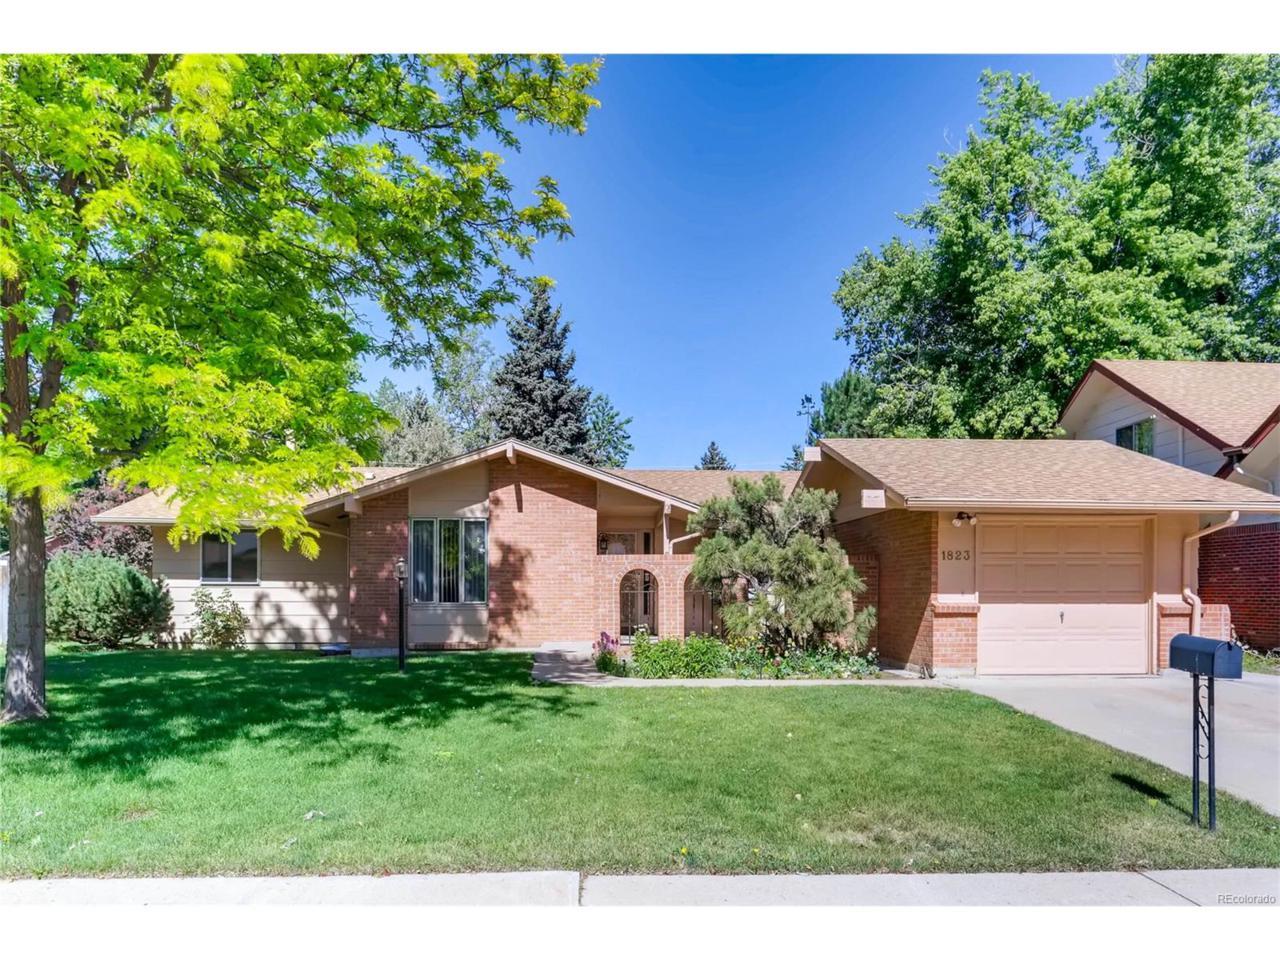 1823 S Pontiac Way, Denver, CO 80224 (MLS #5002487) :: 8z Real Estate